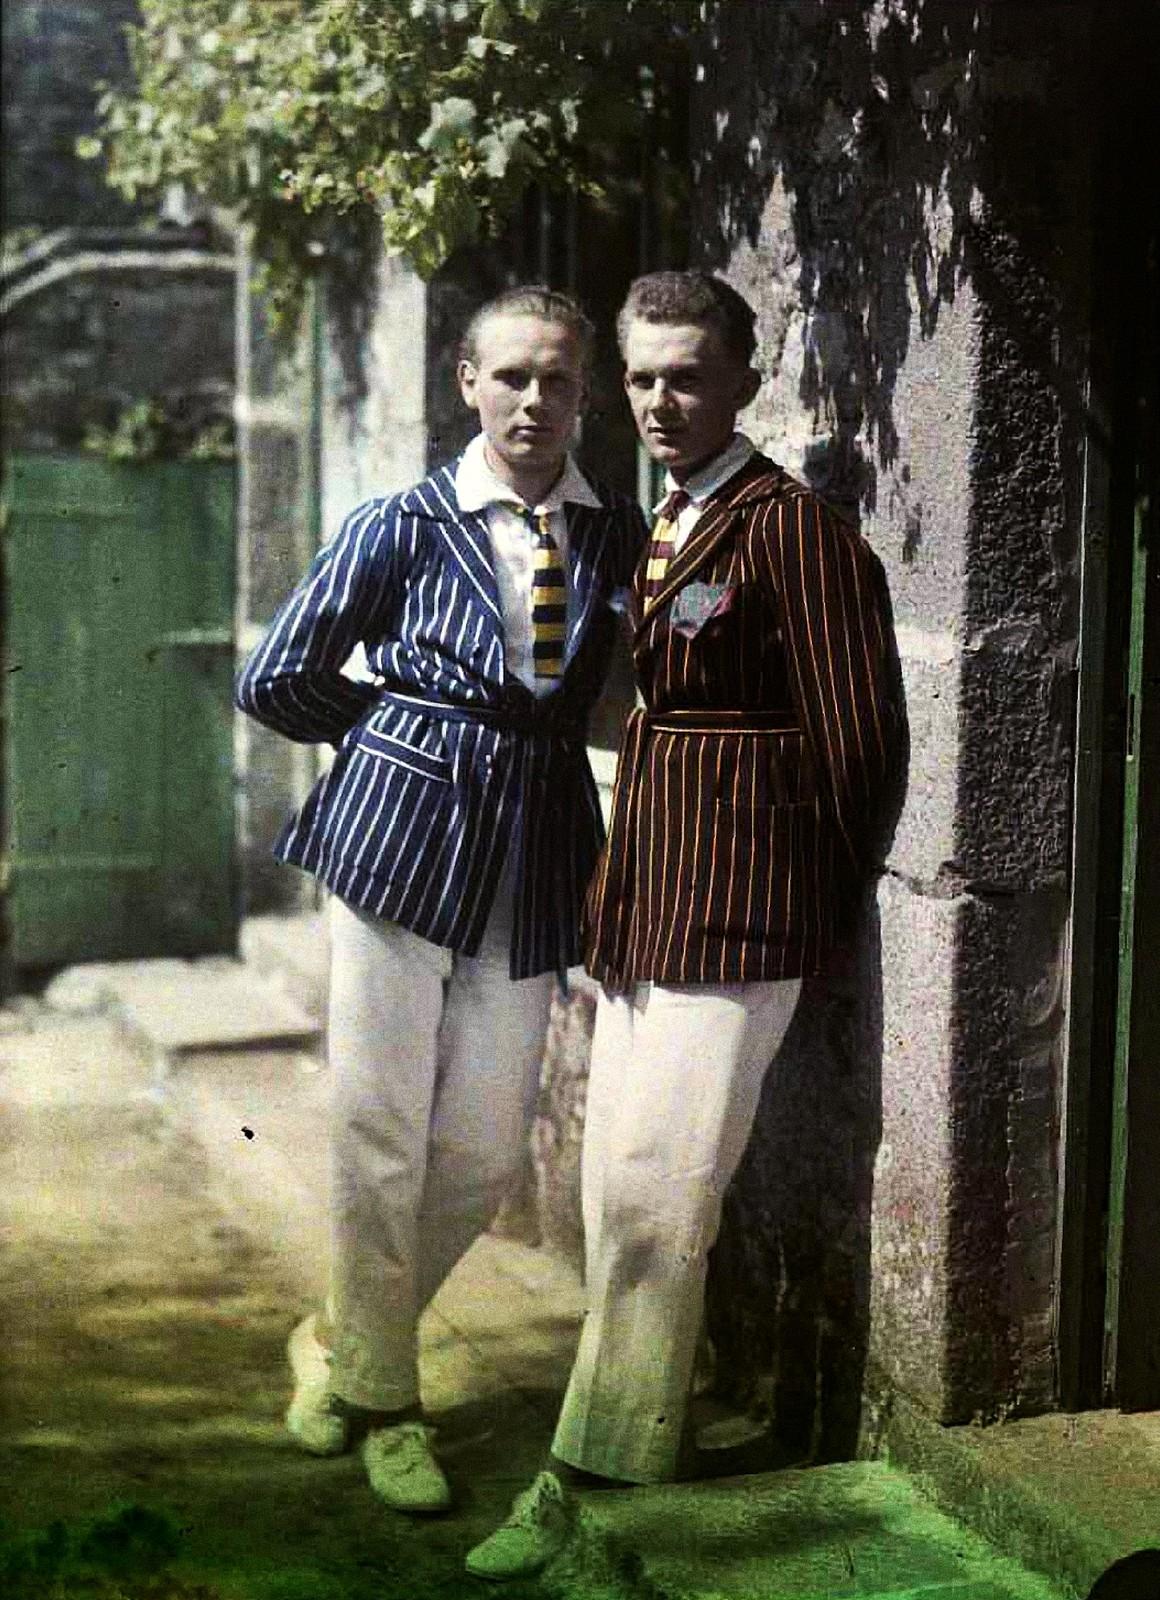 1921. Пьер и Андре Гейн